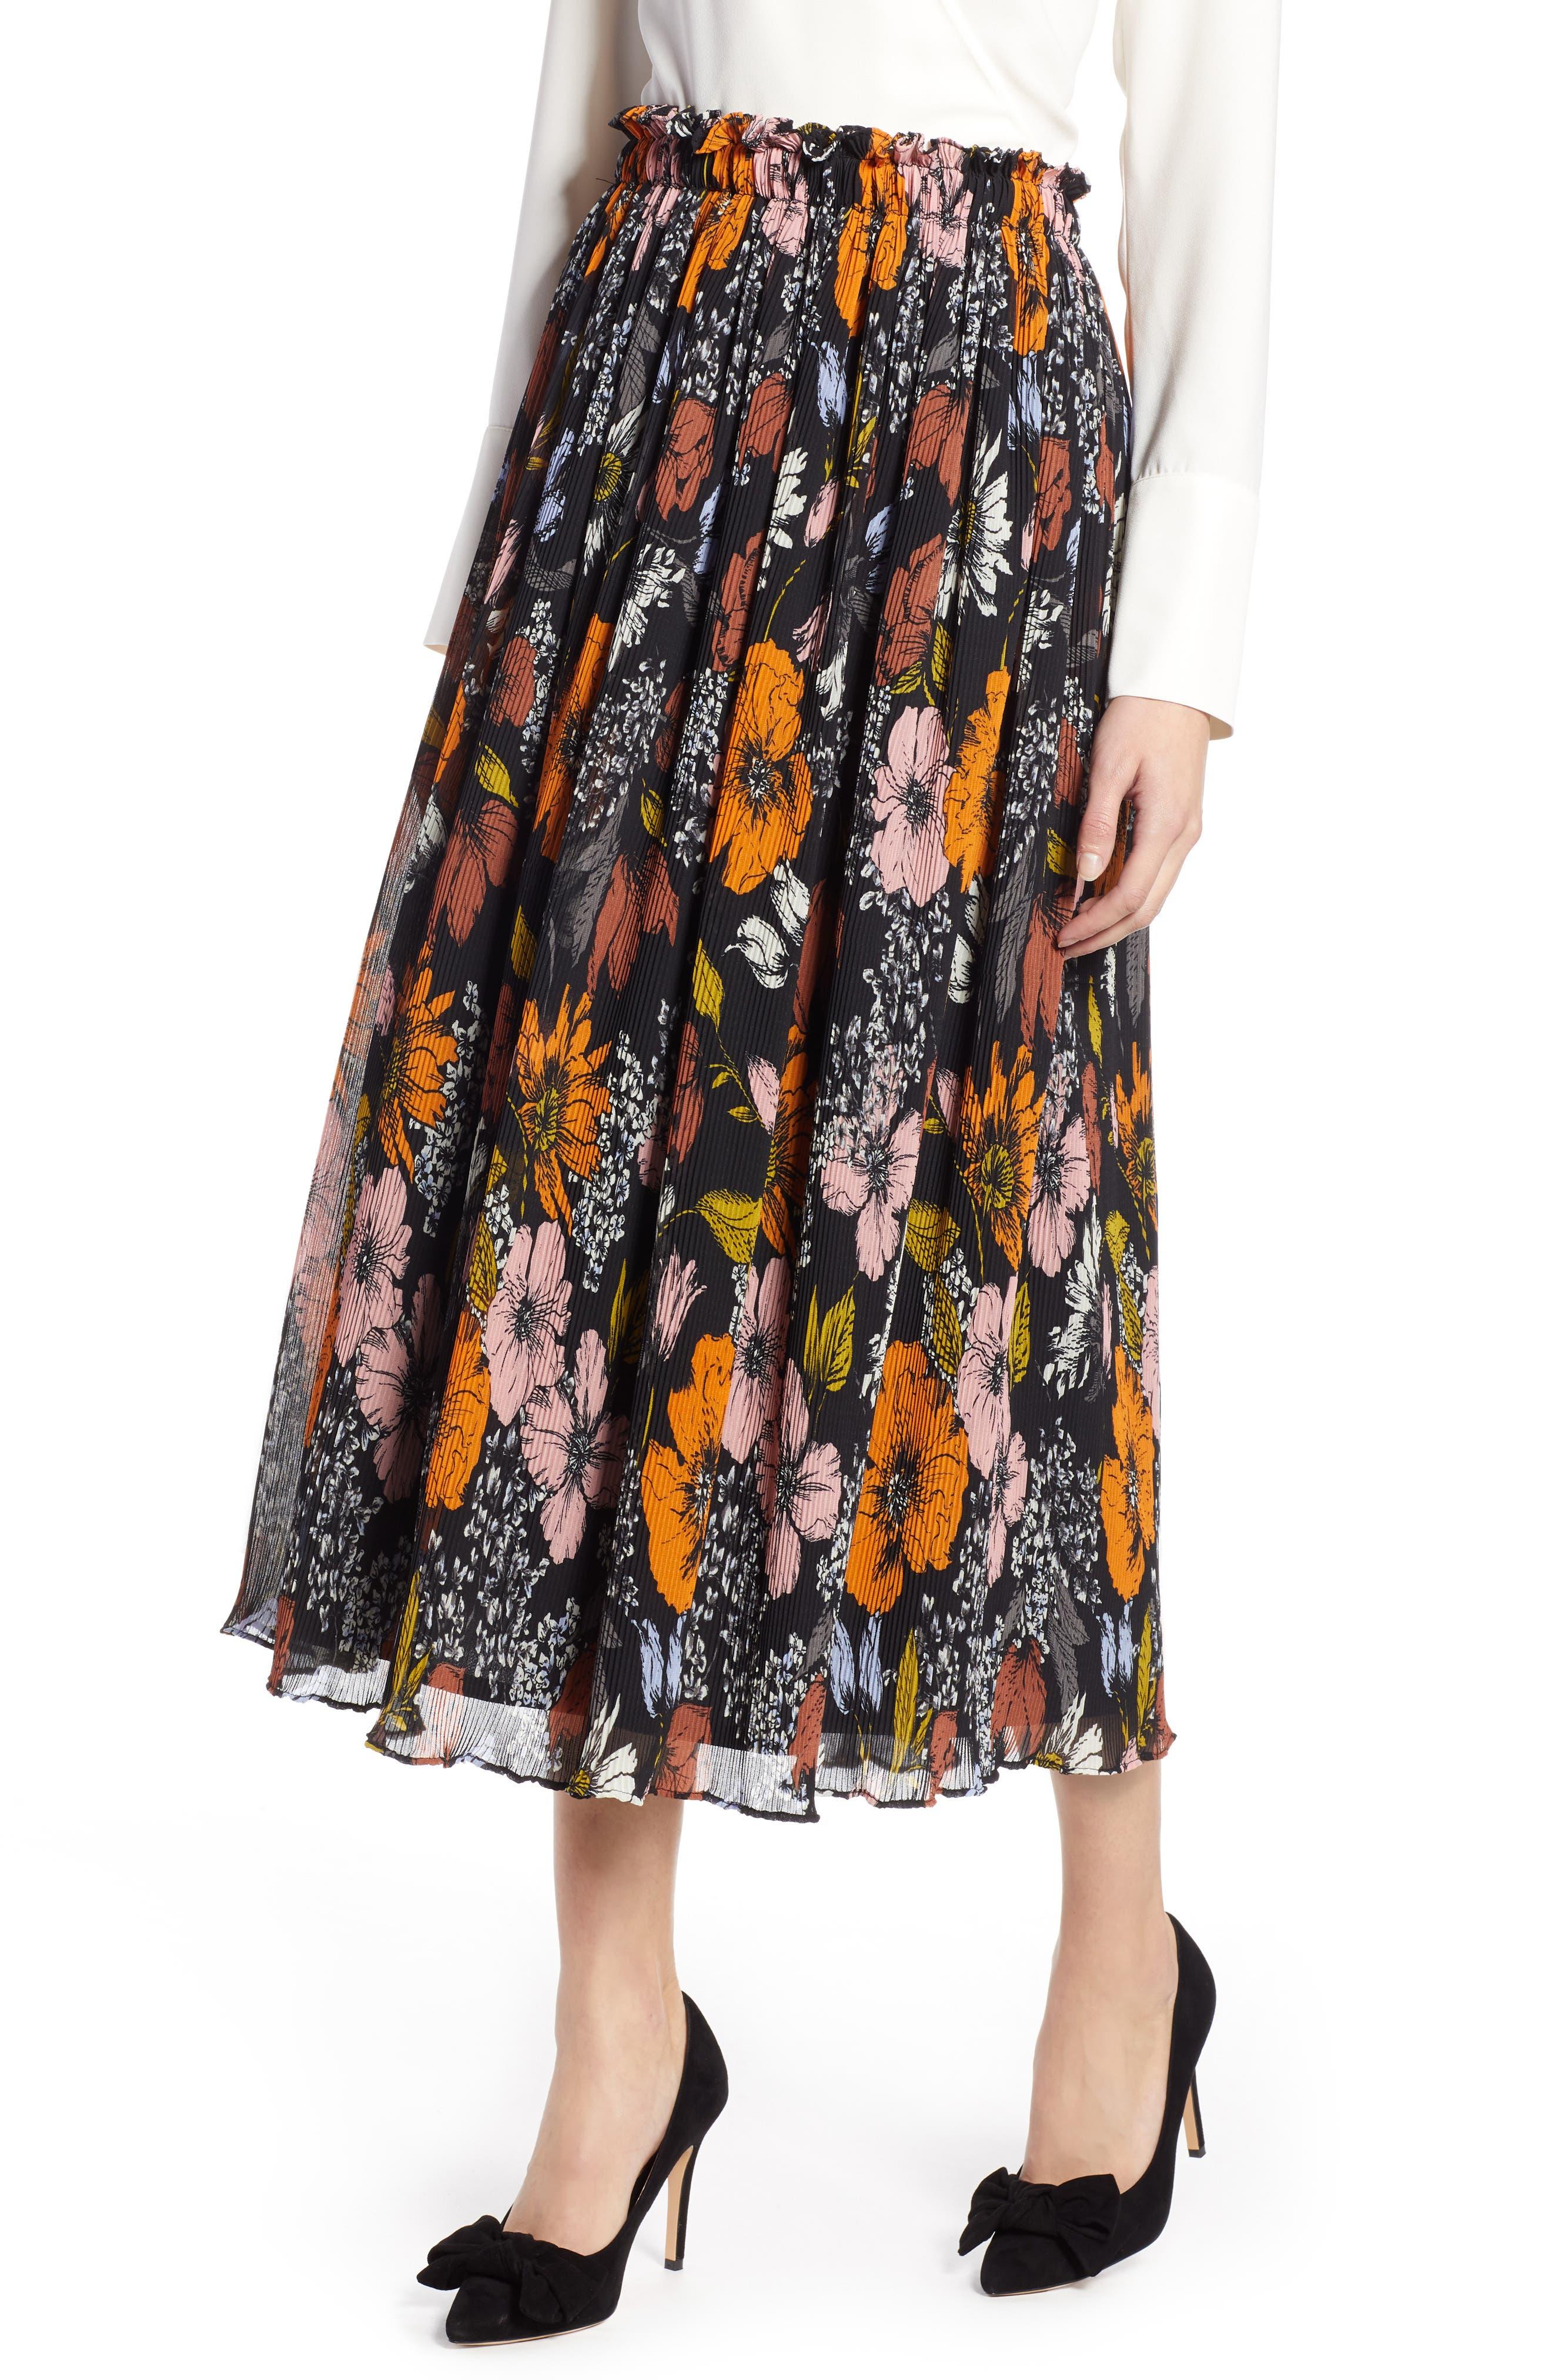 Halogen X Atlantic-Pacific Crinkle Midi Skirt, Black